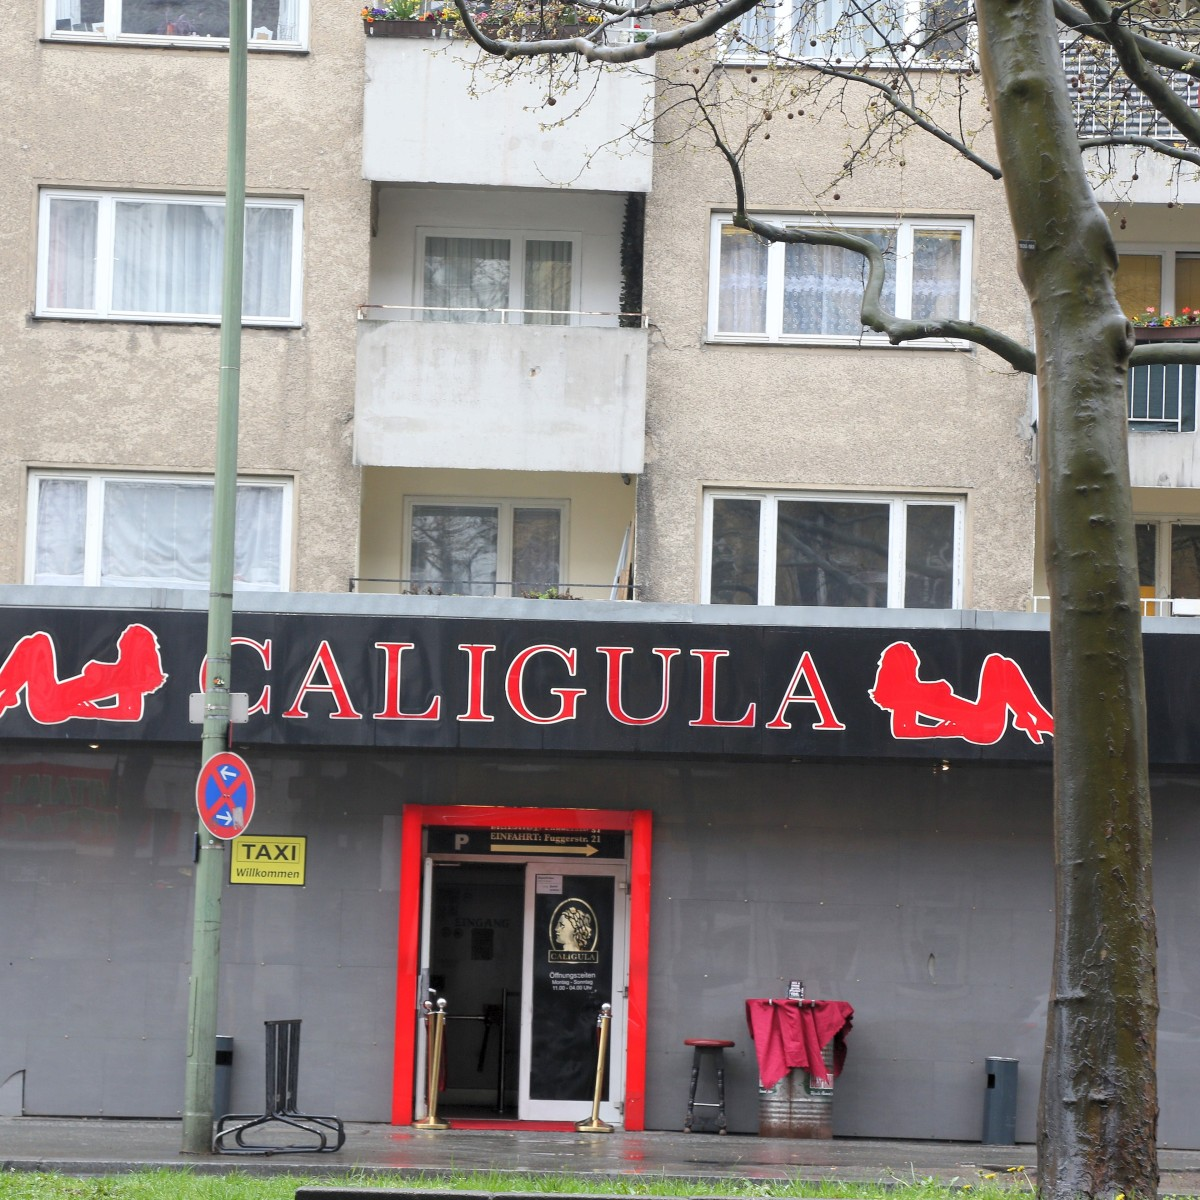 Caligula club berlin